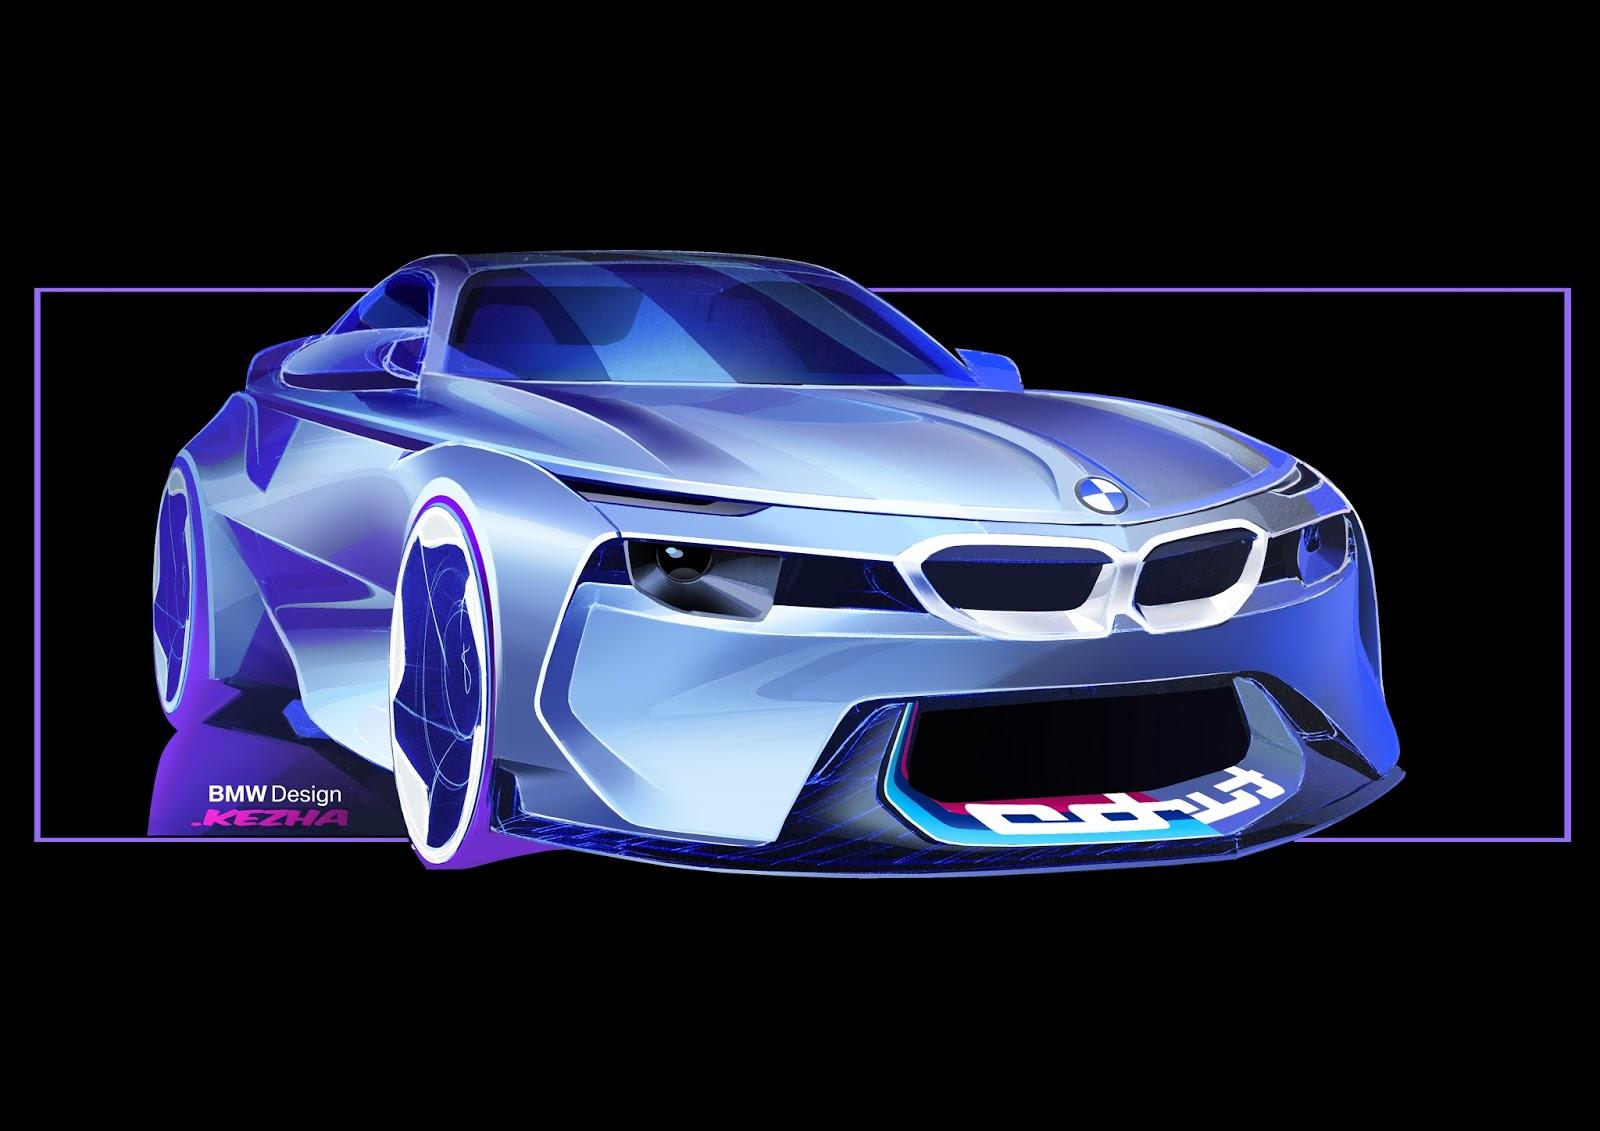 P90219733 highRes bmw 2002 hommage des H BMW γιορτάζει τα 50 χρόνια της θρυλικής 2002 turbo και παρουσιάζει την Bmw 2002 Hommage BMW, BMW 2002, BMW 2002 turbo, BMW Concept, BMW Hommage, supercars, videos